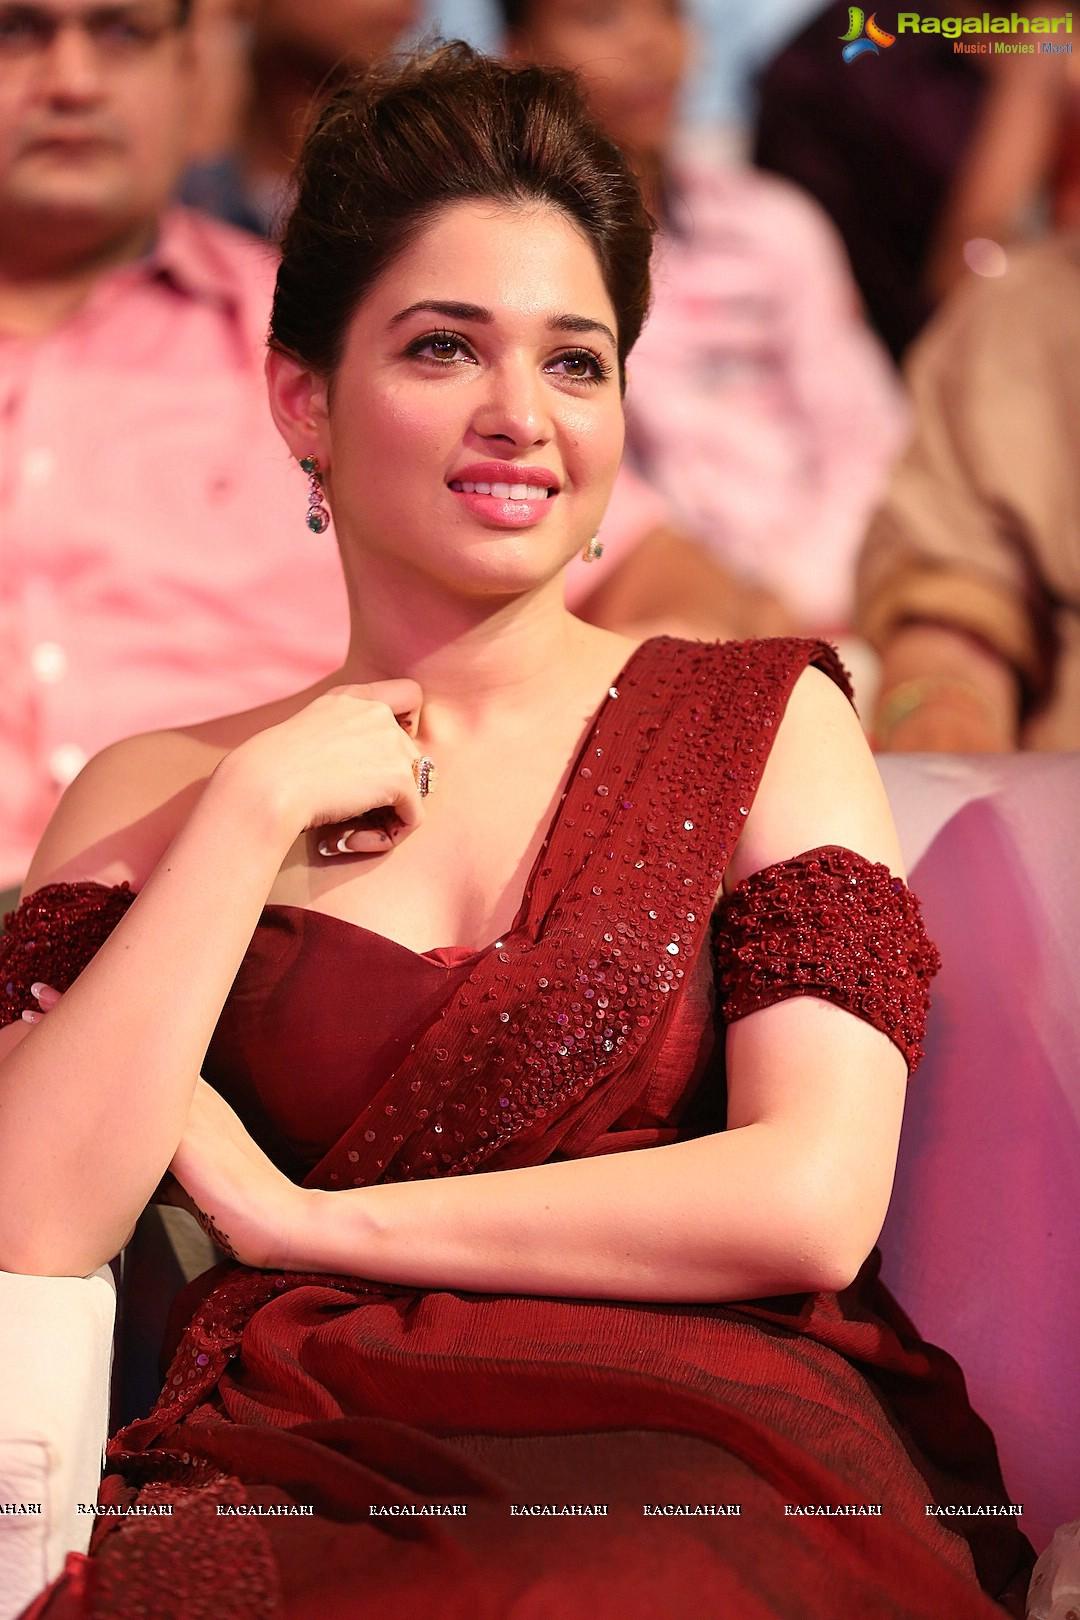 tamannaah bhatia image 559 | telugu actress images,stills, heroines